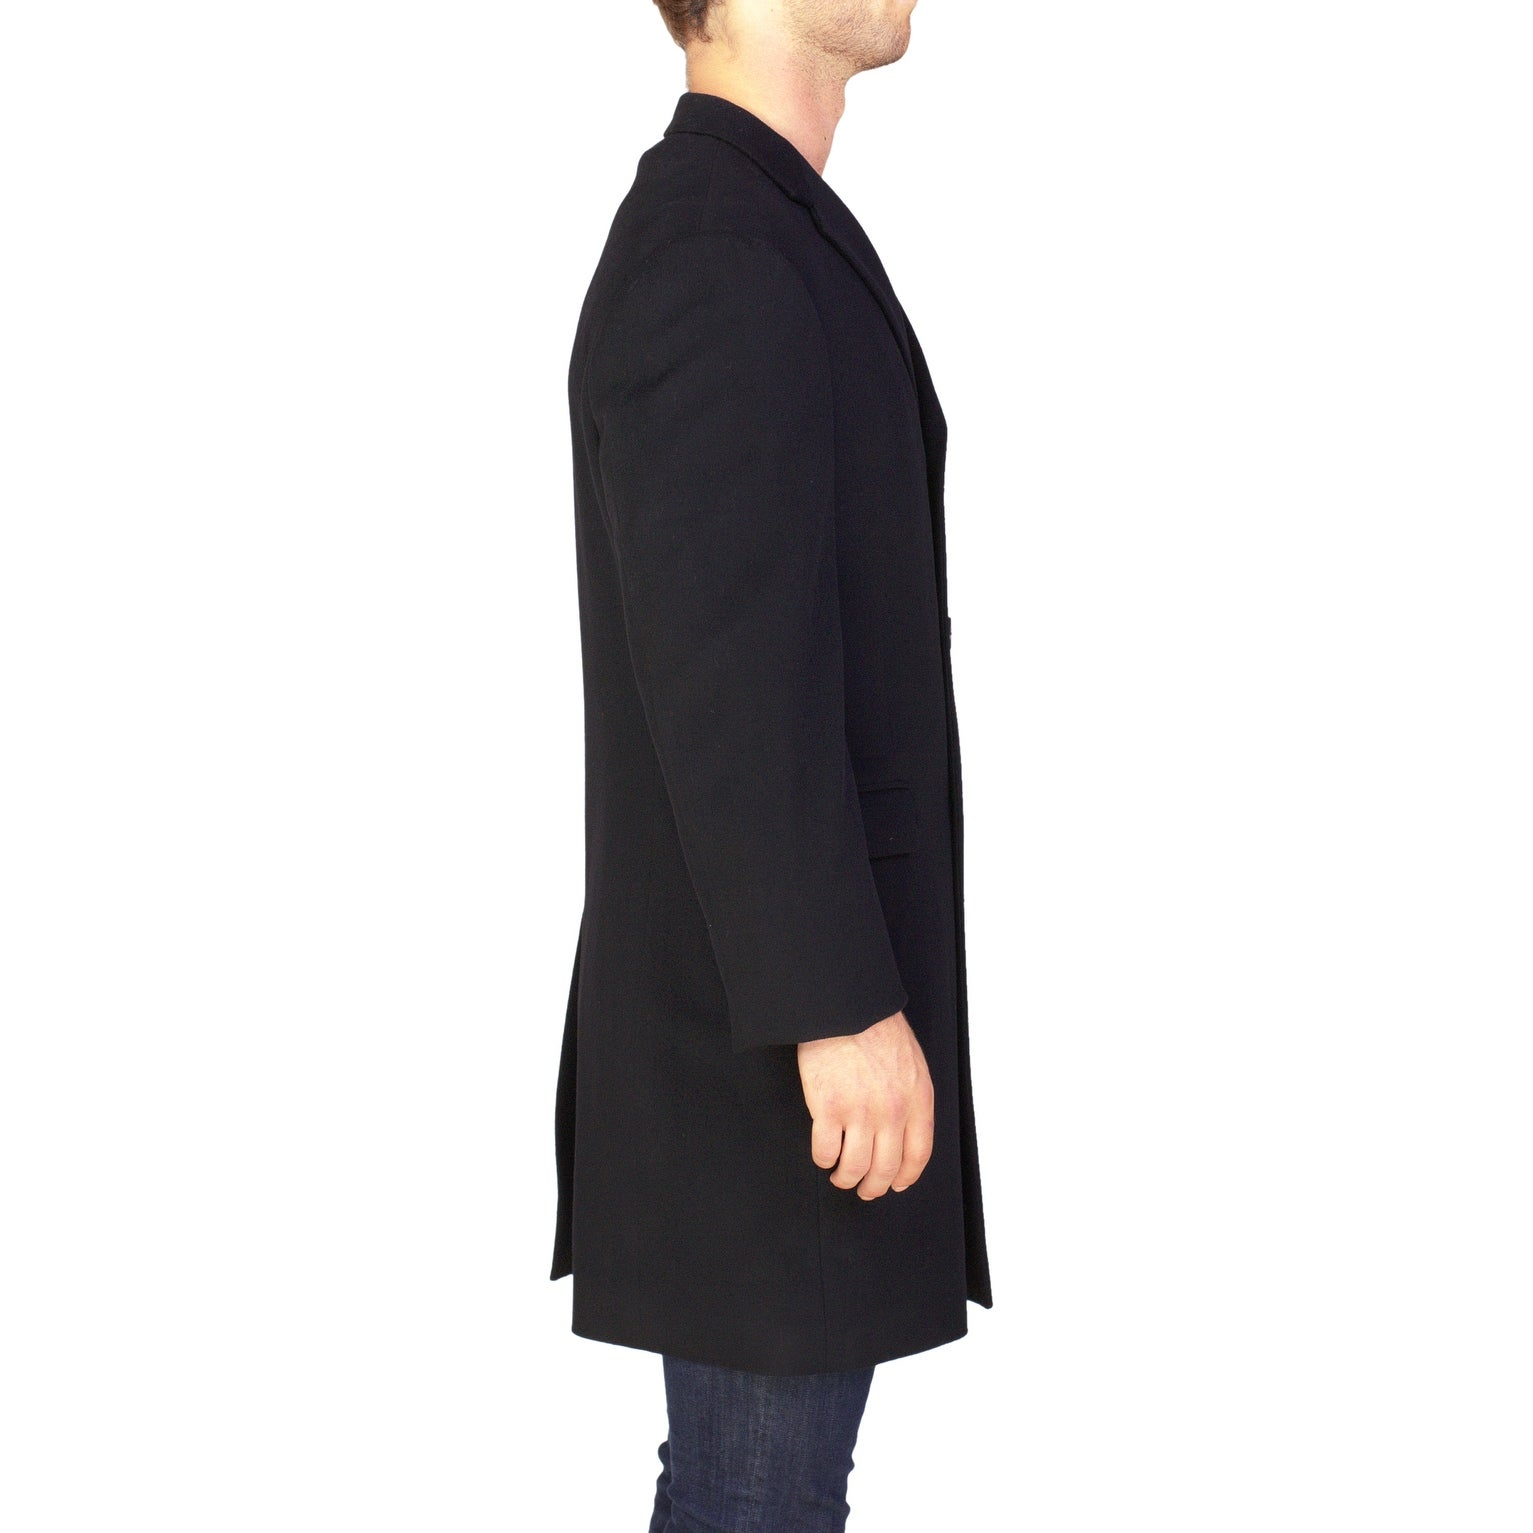 542c028b335 Shop Yves Saint Laurent Men's Virgin Wool Trench Coat Jacket Black - 42 -  Free Shipping Today - Overstock - 17167739